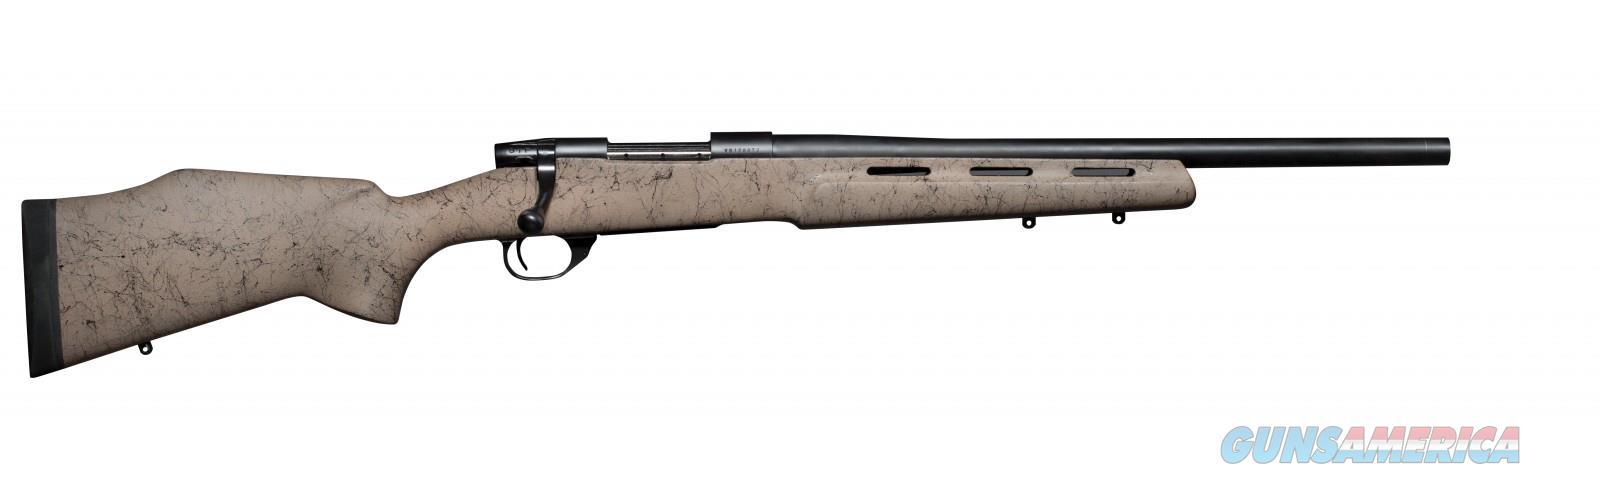 "Weatherby Vanguard H-Bar RC 6.5 Creedmoor 20"" VDN65CMR0T   Guns > Rifles > Weatherby Rifles > Sporting"